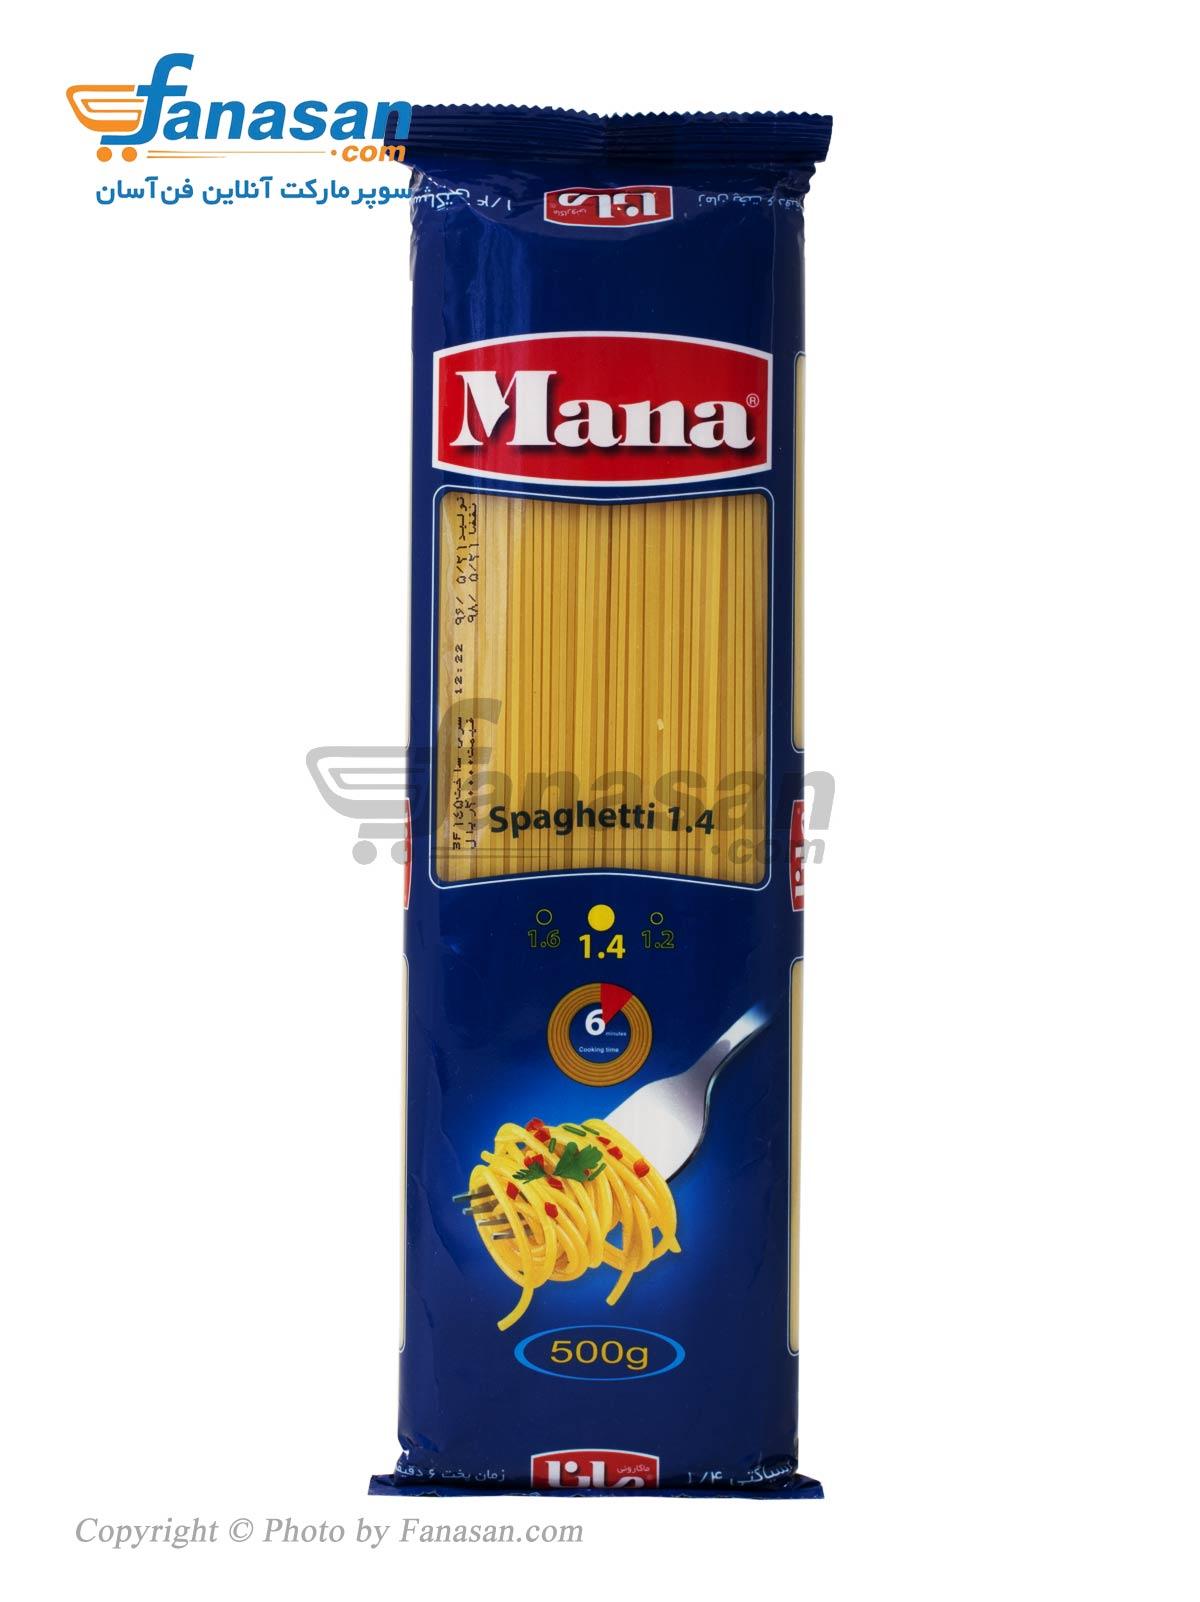 اسپاگتی مانا قطر 1/4 با آرد سمولینا 500 گرم